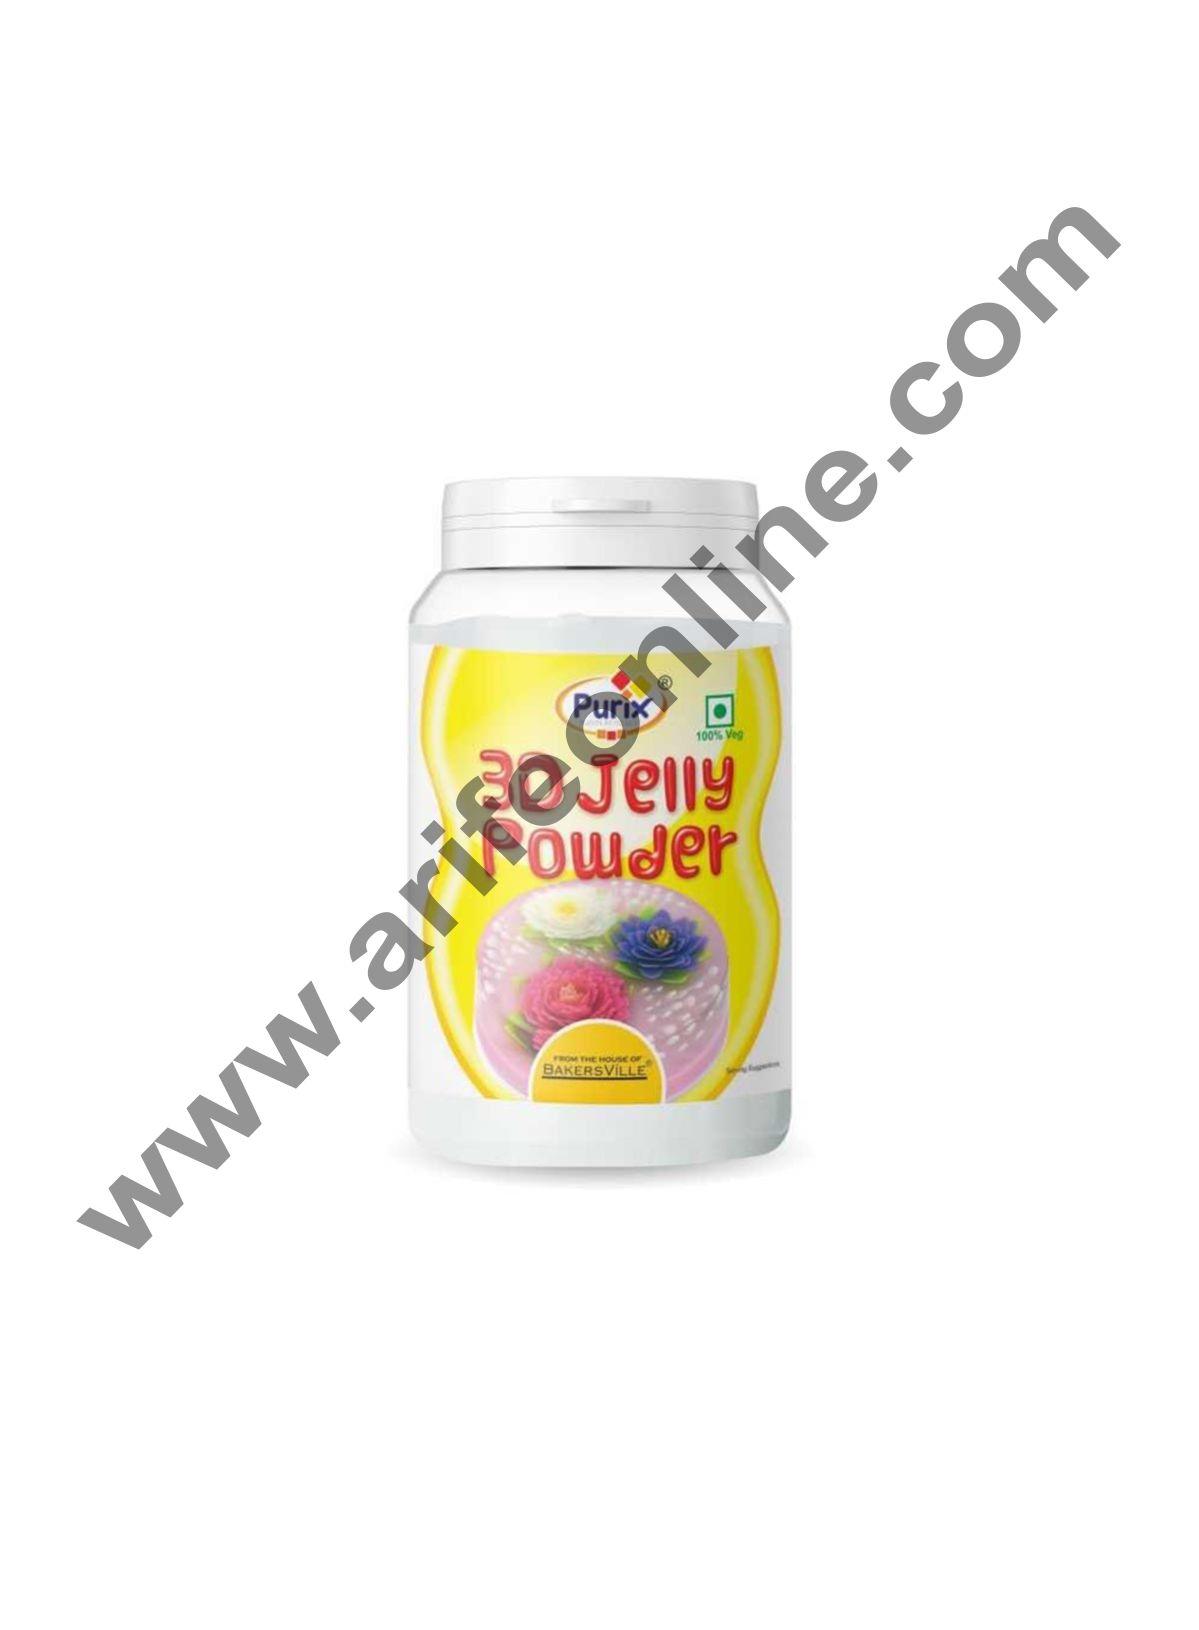 Purix™ 3D Jelly Powder, 75gm